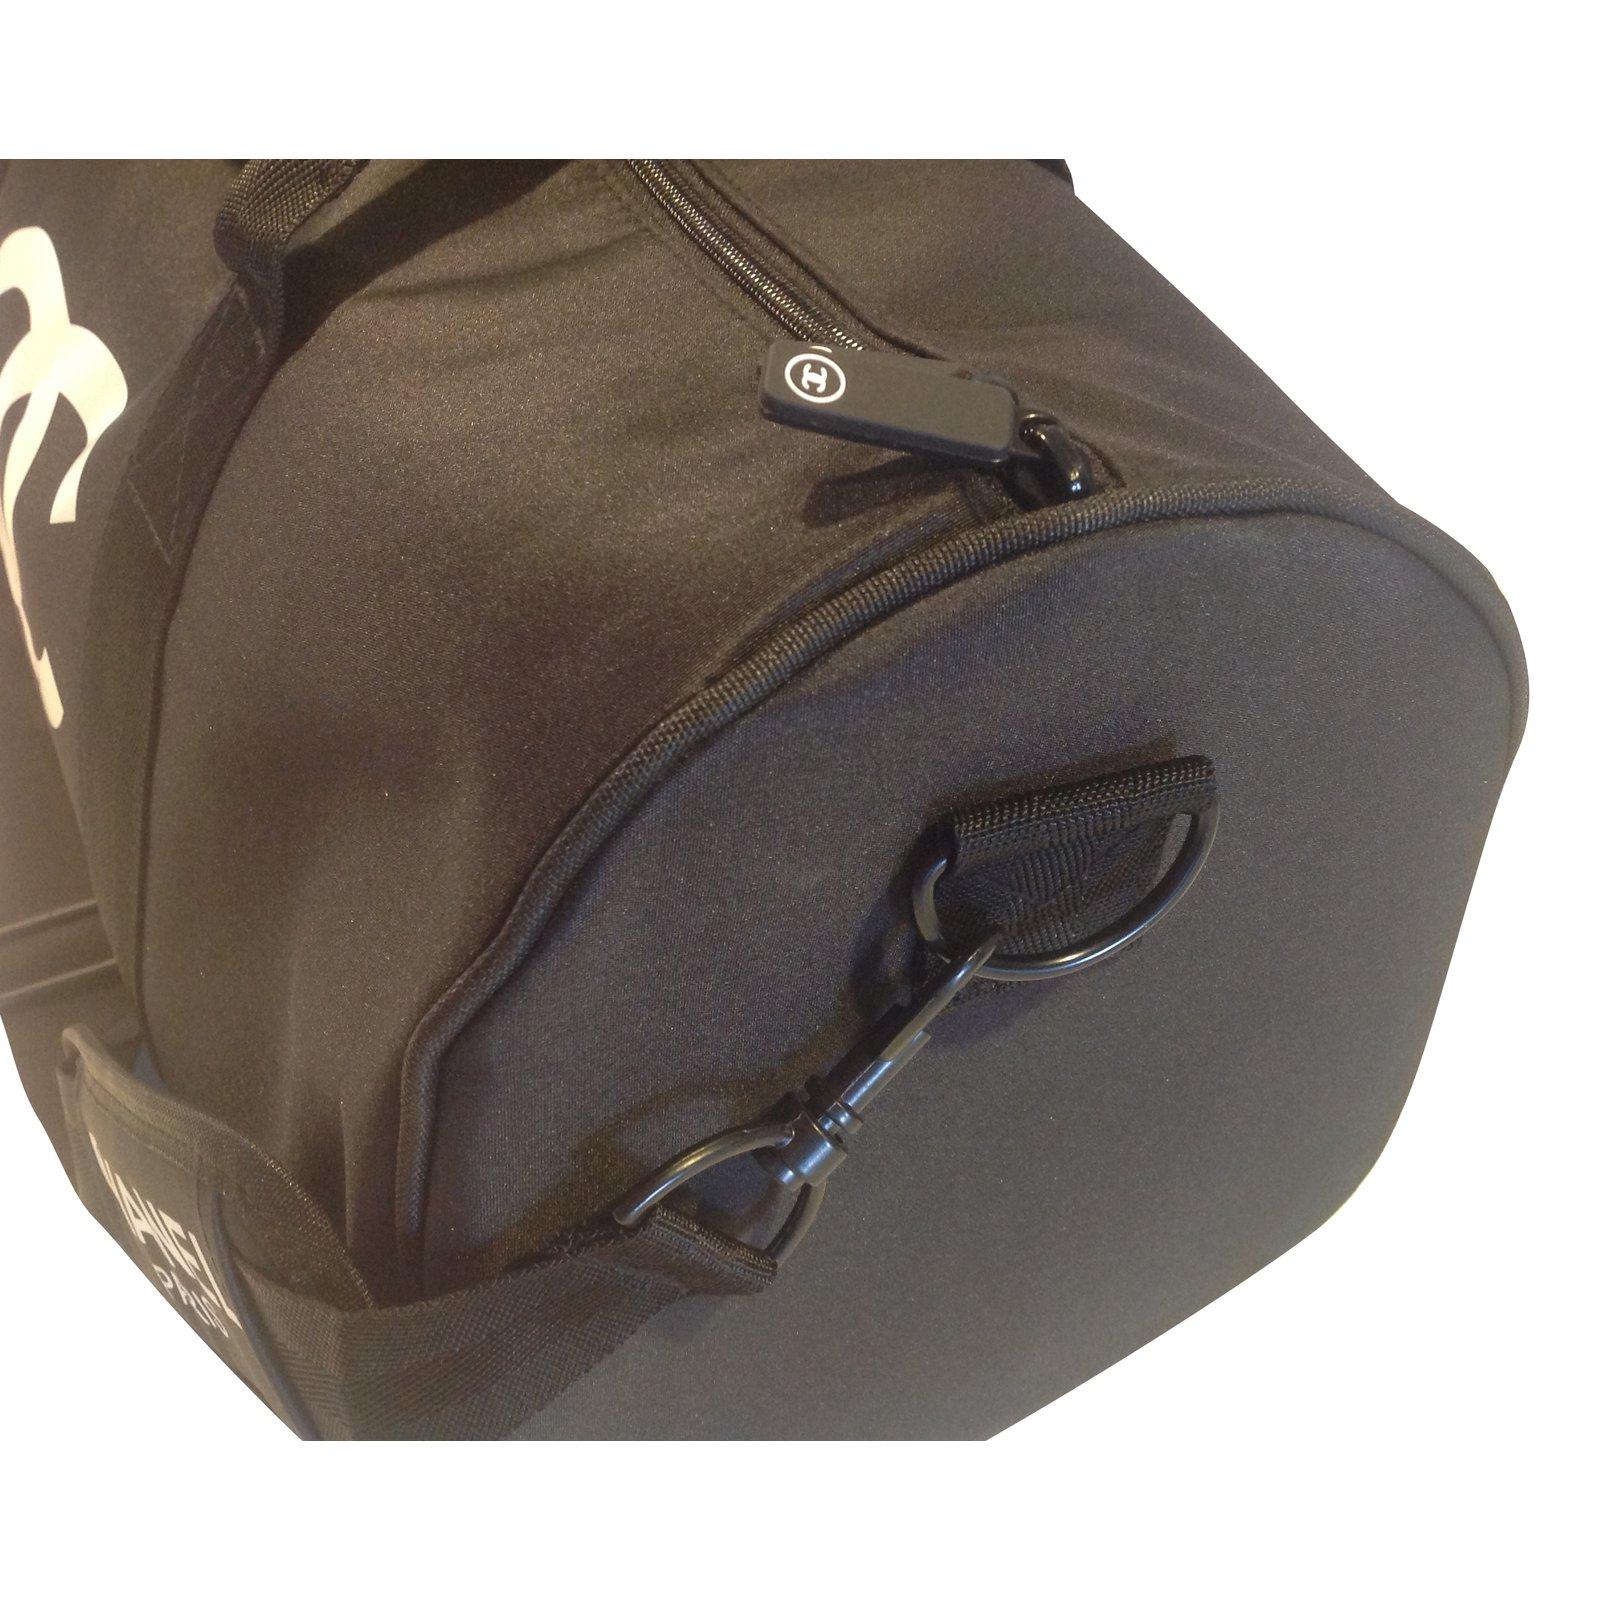 189b009d7ef106 Chanel Vip Gift Travel Bag